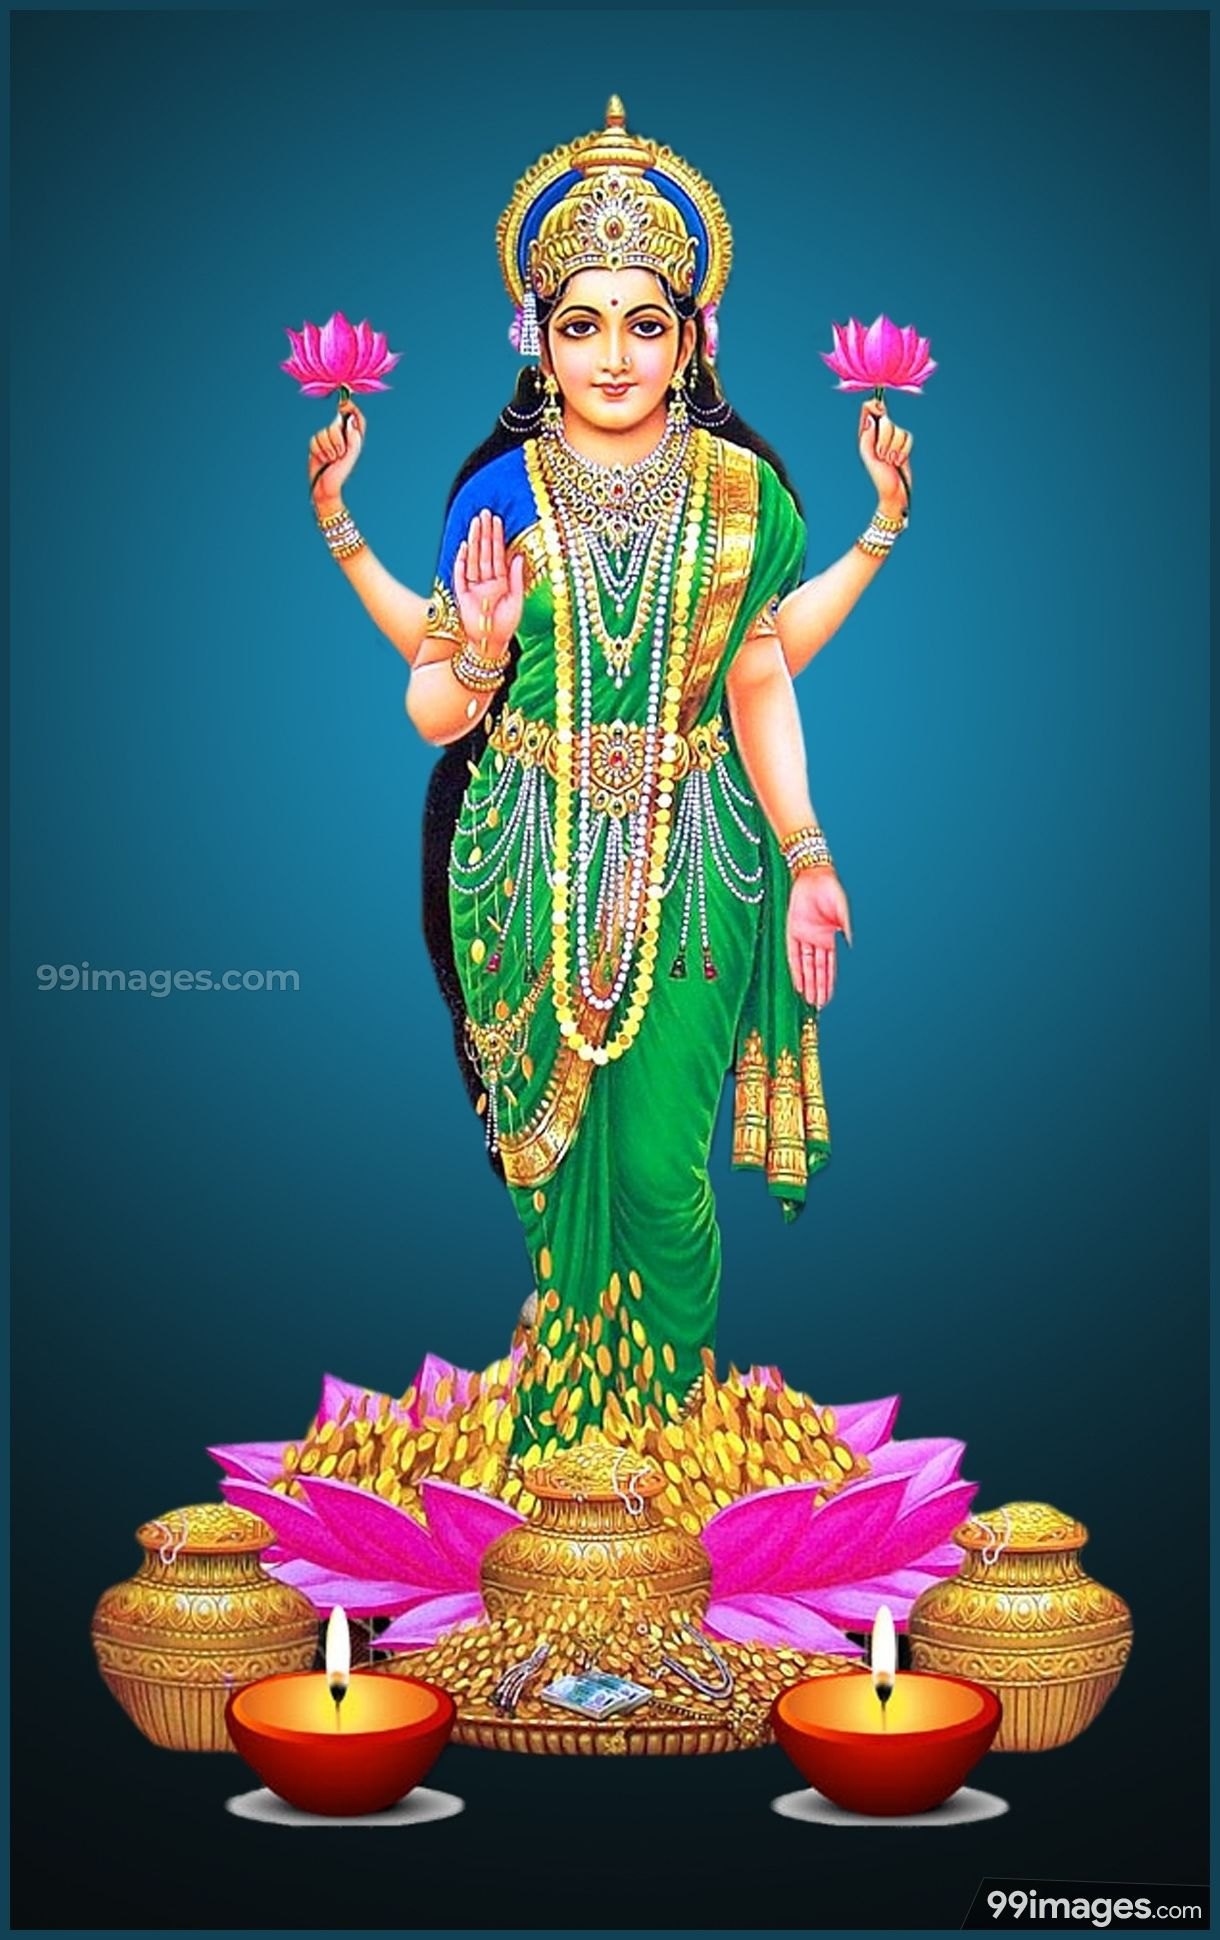 download hindu god lakshmi hd wallpaper hd backgrounds download itl cat download hindu god lakshmi hd wallpaper